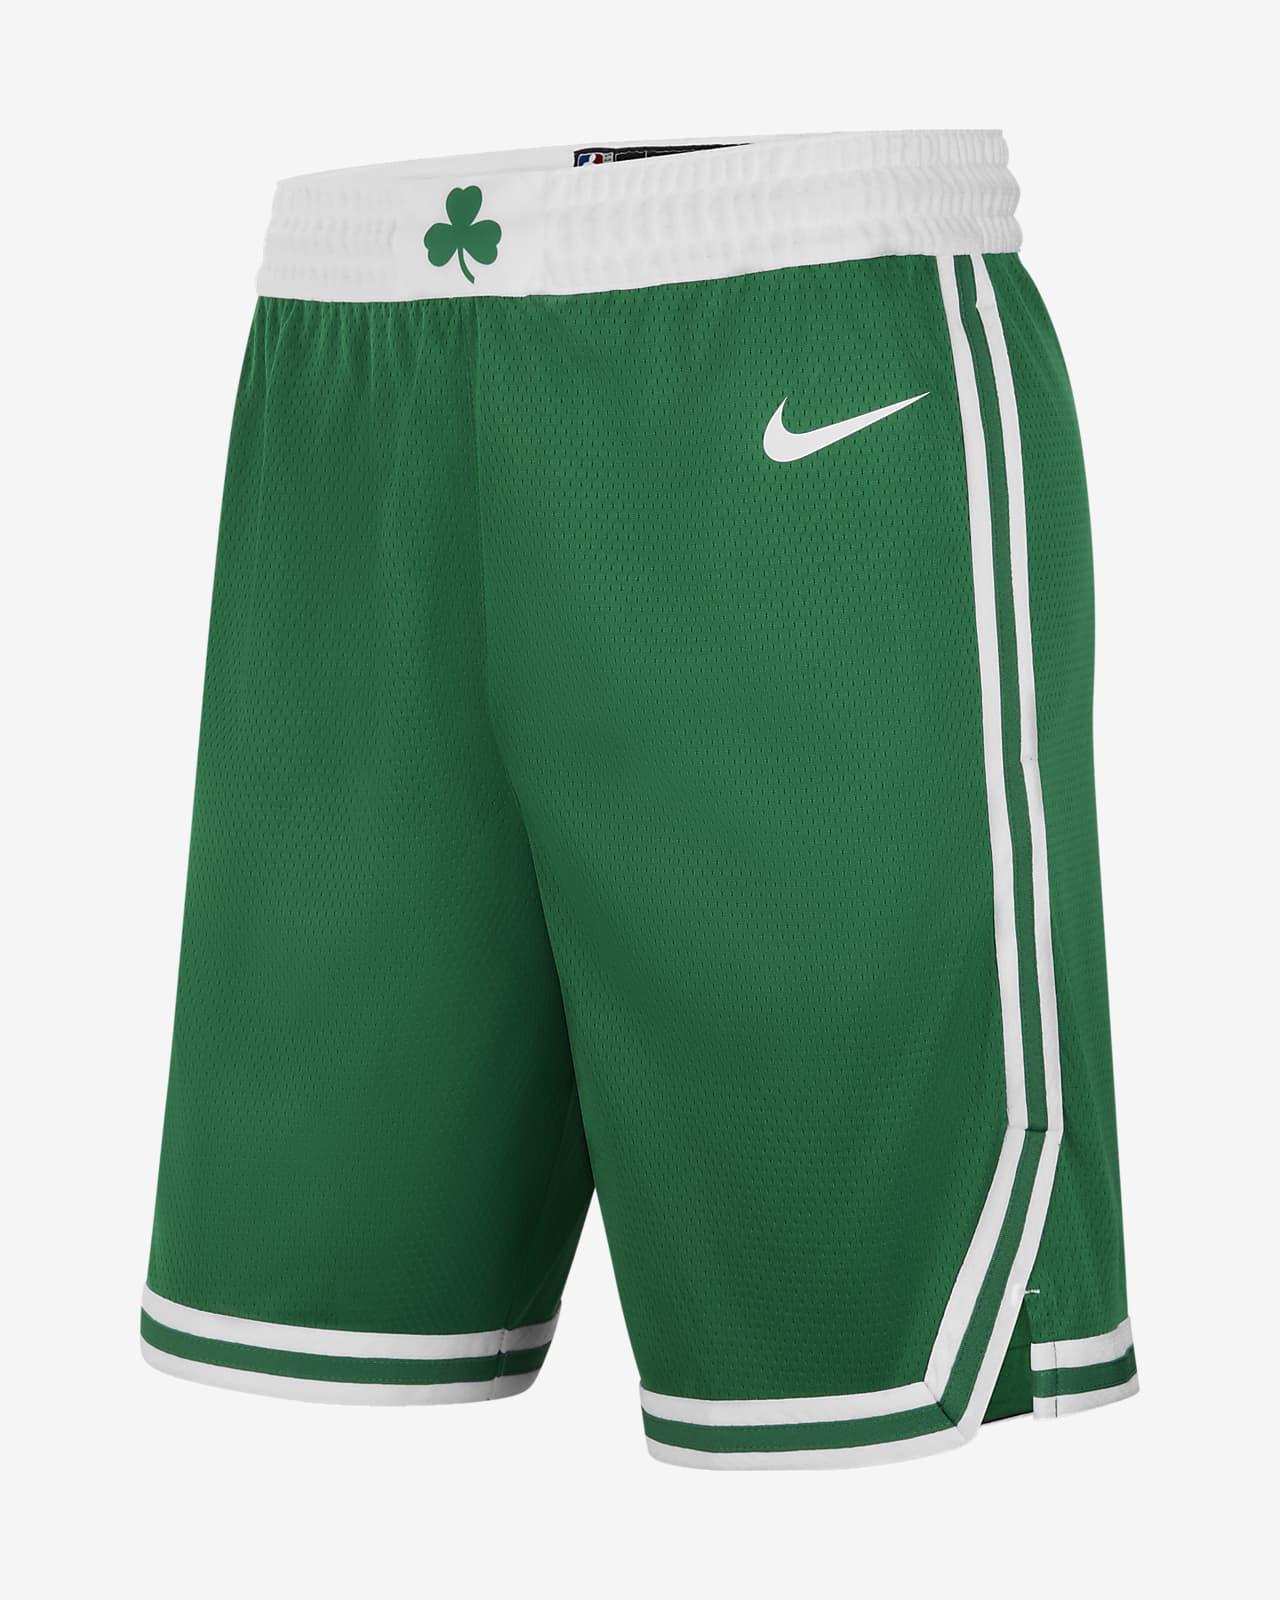 Shorts Nike NBA Swingman para hombre Boston Celtics Icon Edition